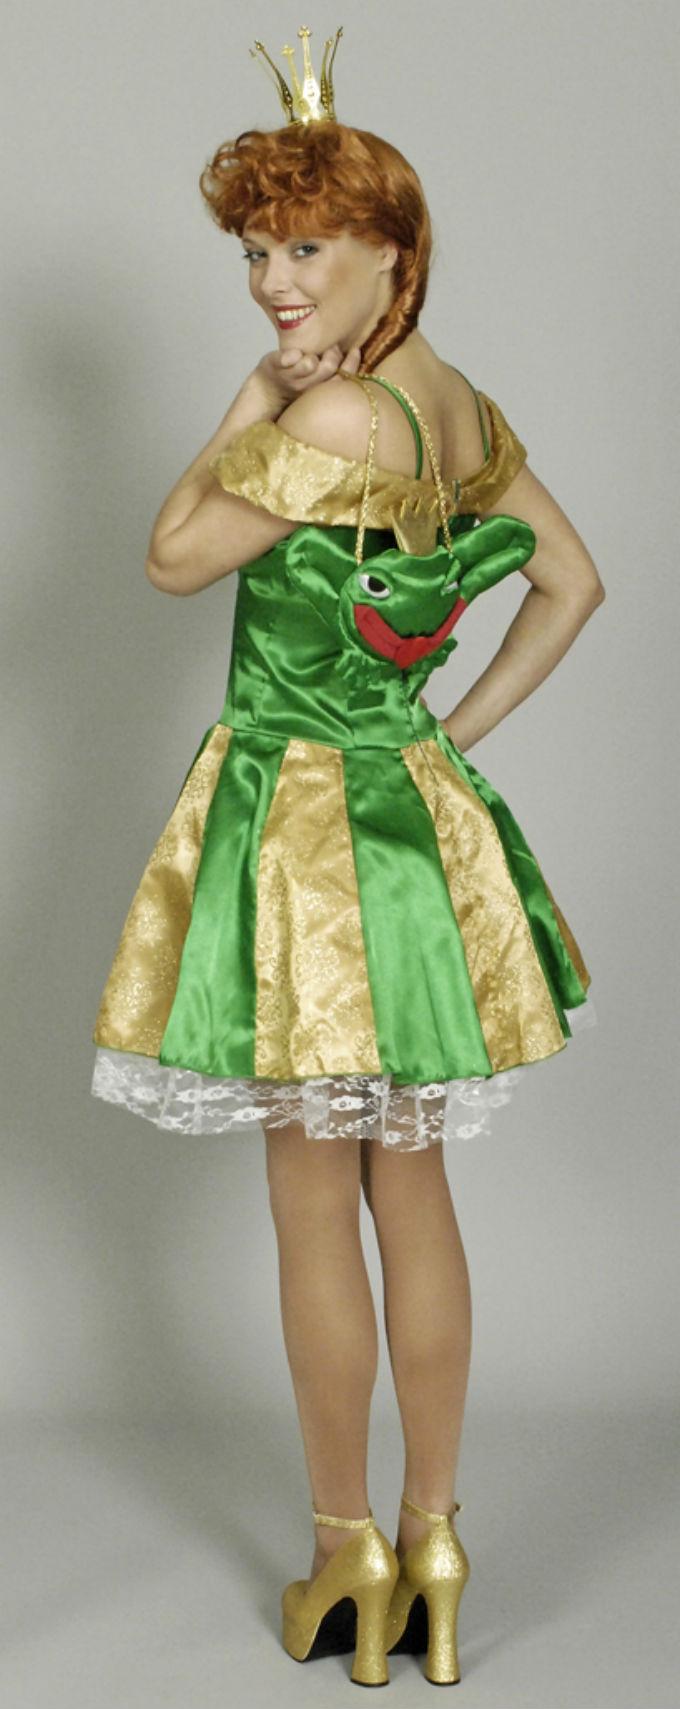 Froschkonigin Kostum Damen Elfe Fee Gold Grun Marchen Gr 36 46 Karneval Fasching Internerkarneval Webshop